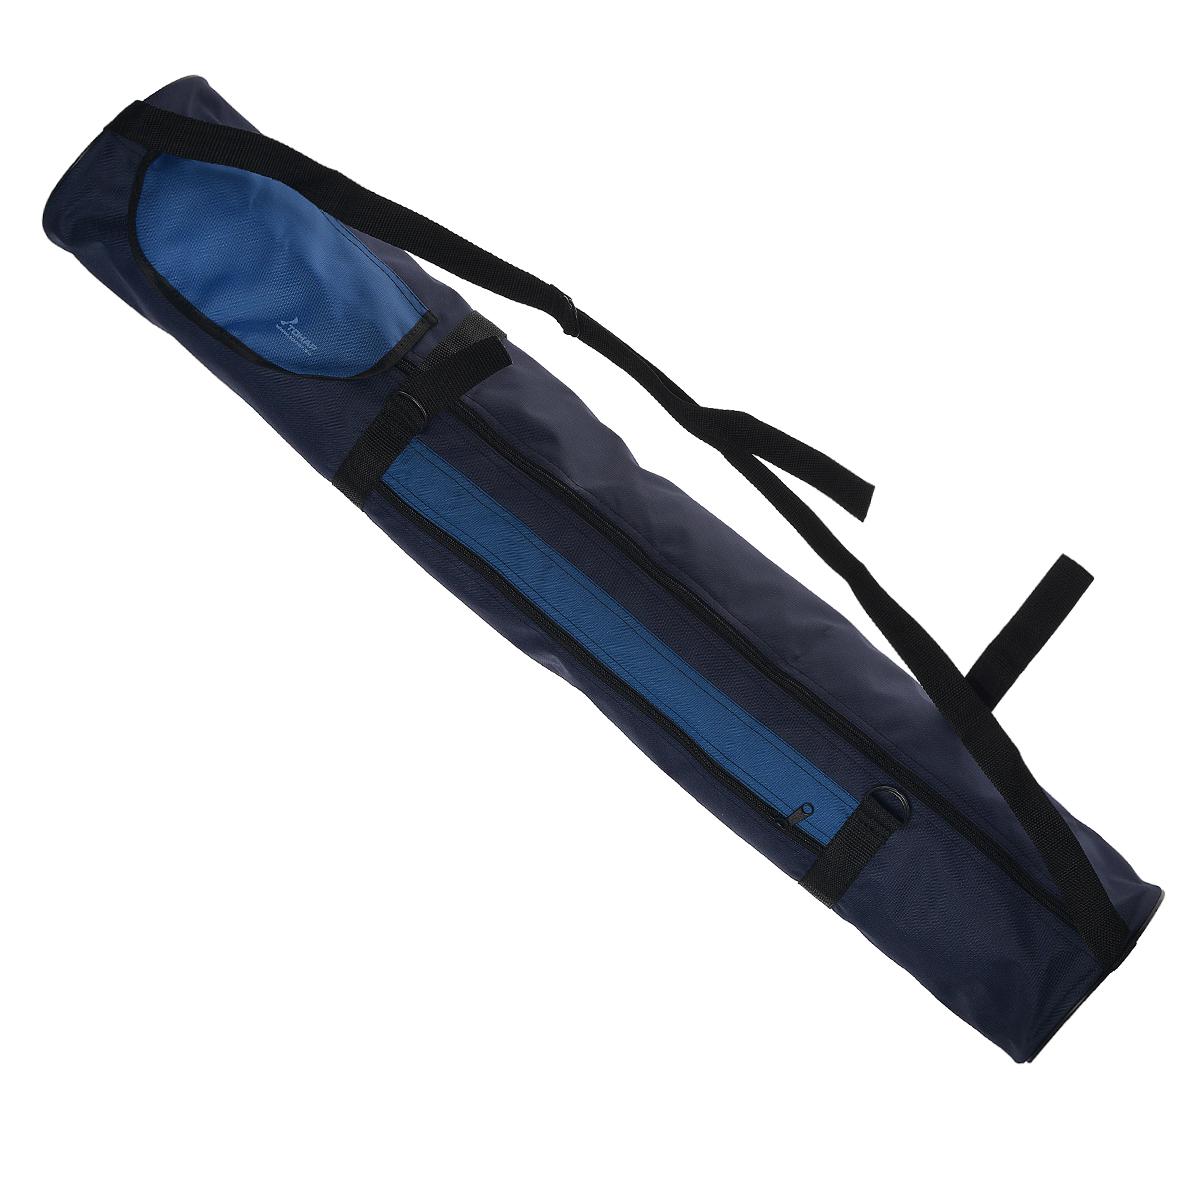 Чехол тканевый Тонар, для Торнадо-М, 130 мм аксессуар черпак рыбака тонар спортивный 005755